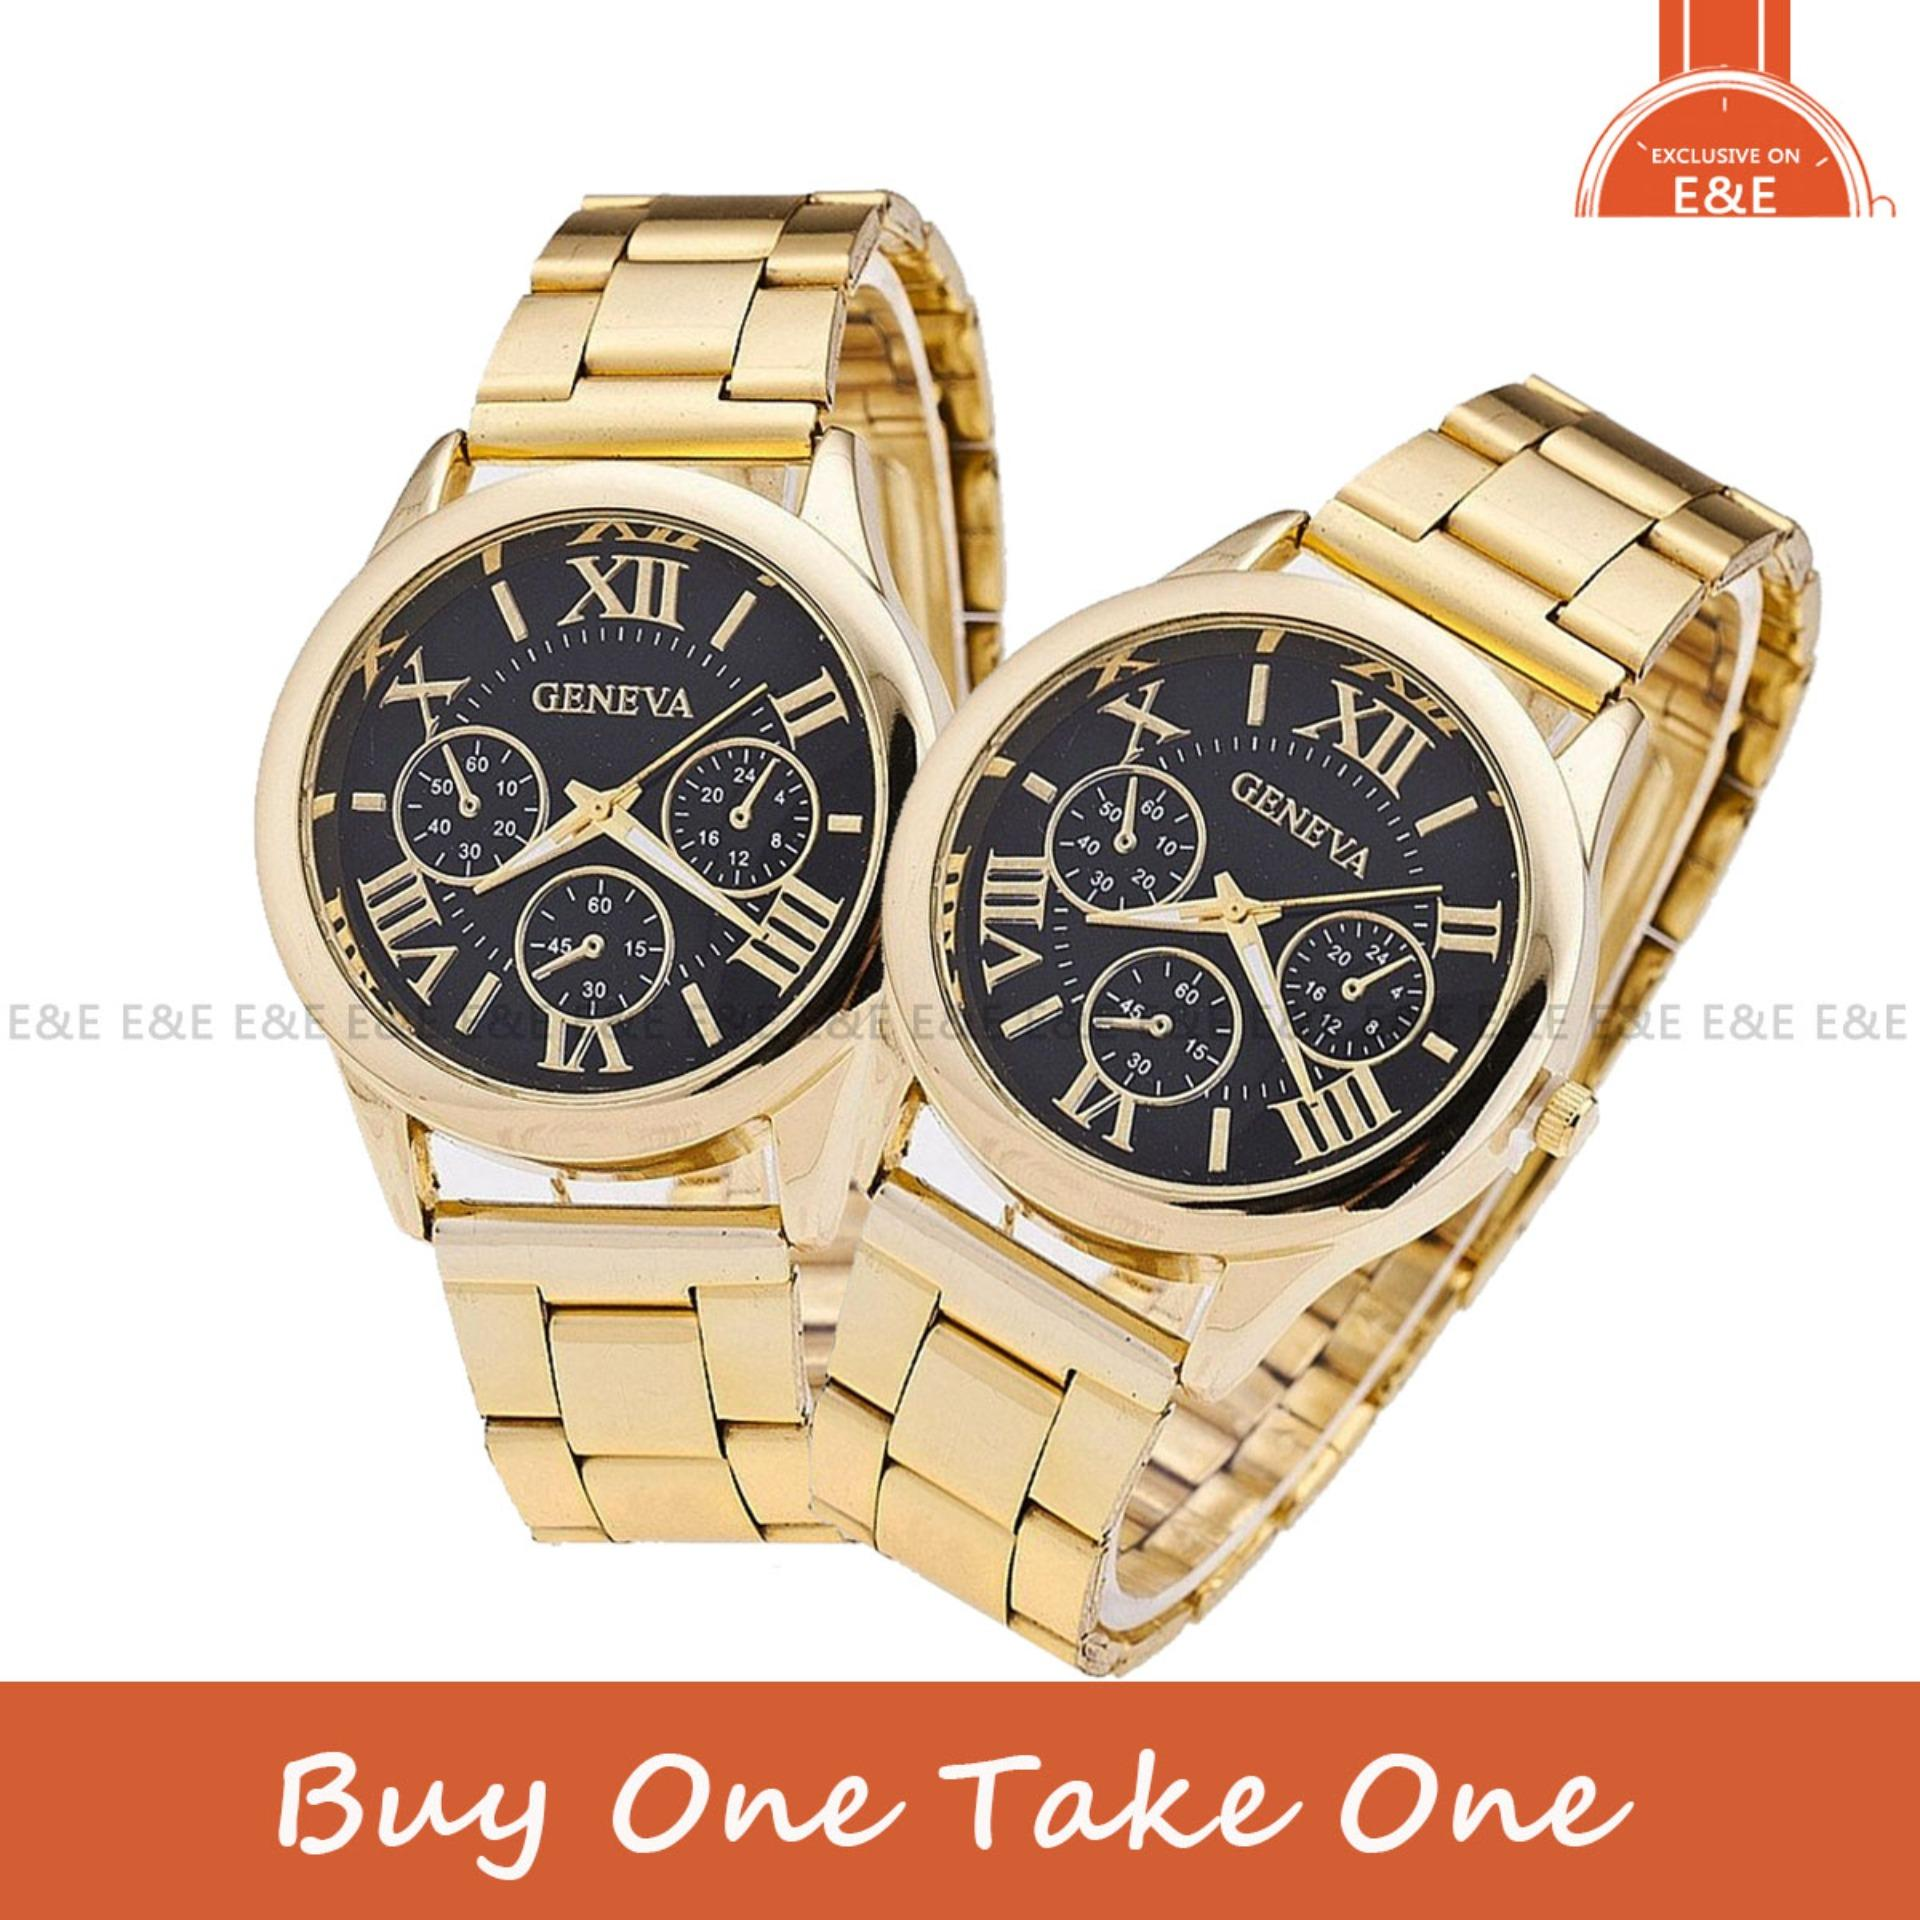 9ad0cafaf03 Geneva SY-3 Roman Numerals Women s Gold Black Steel-belt Watch BUY 1